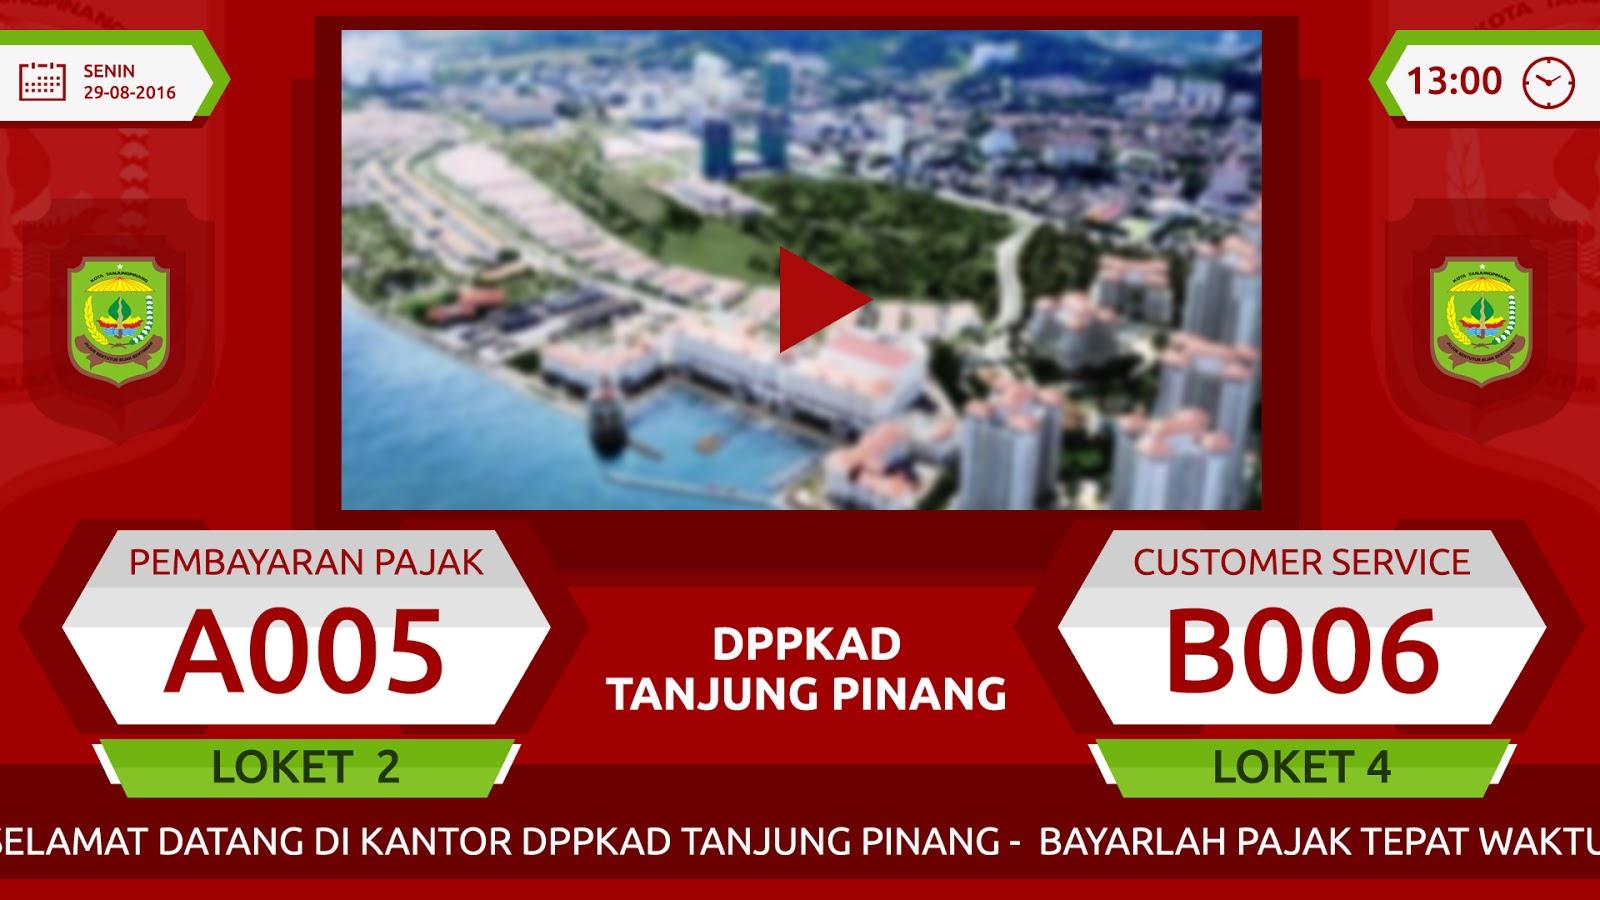 Multimedia mesin antrian DPPKAD Tanjungpinang